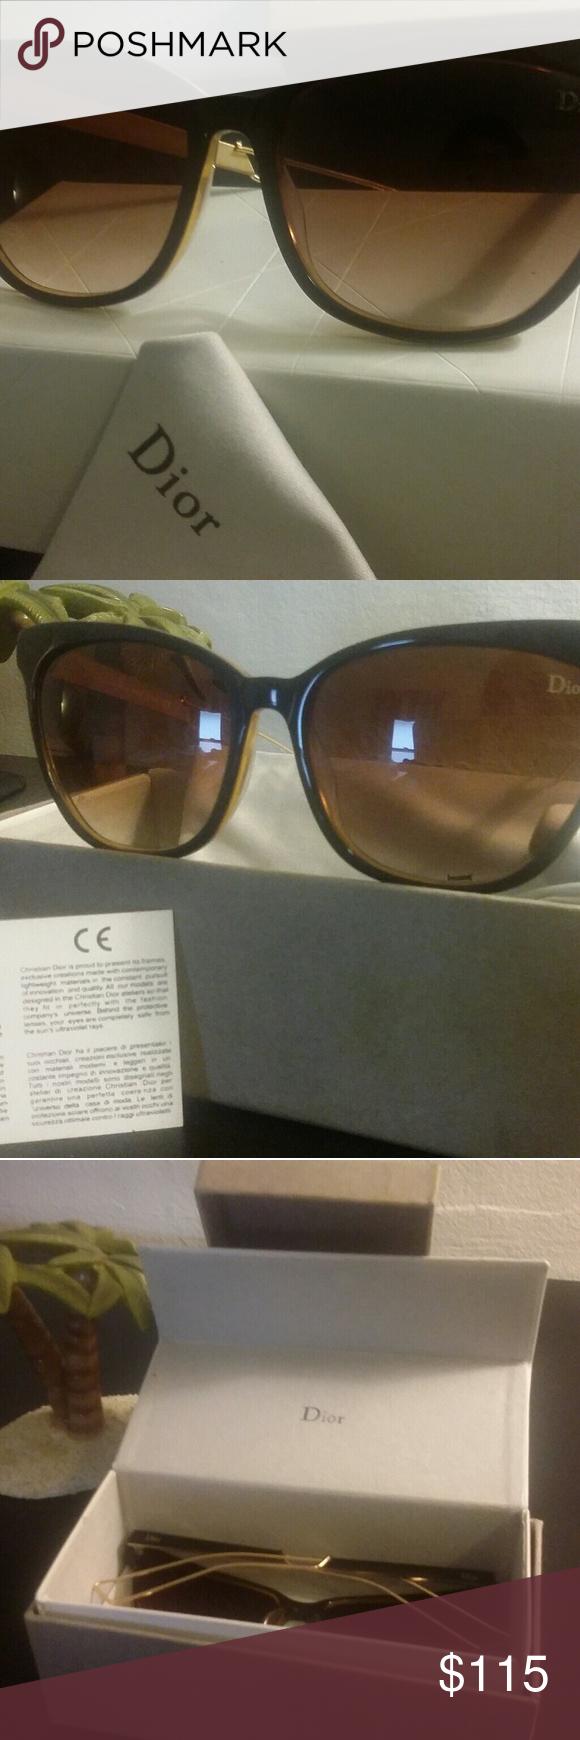 2c2bcb35493 Brand New stunning Christian Dior women Sunglass